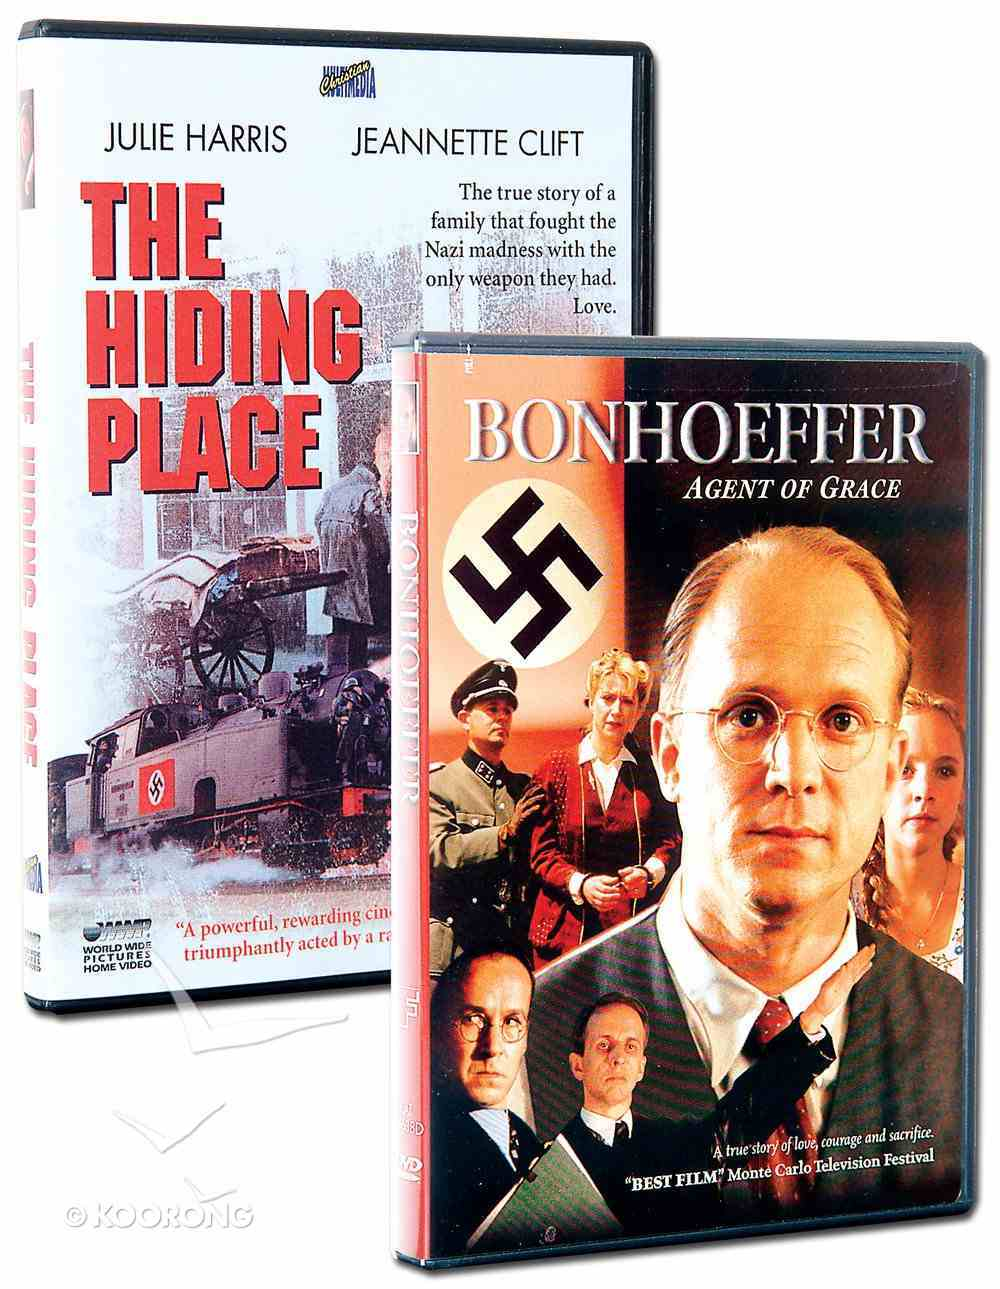 Hiding Place / Bonhoeffer Pack DVD